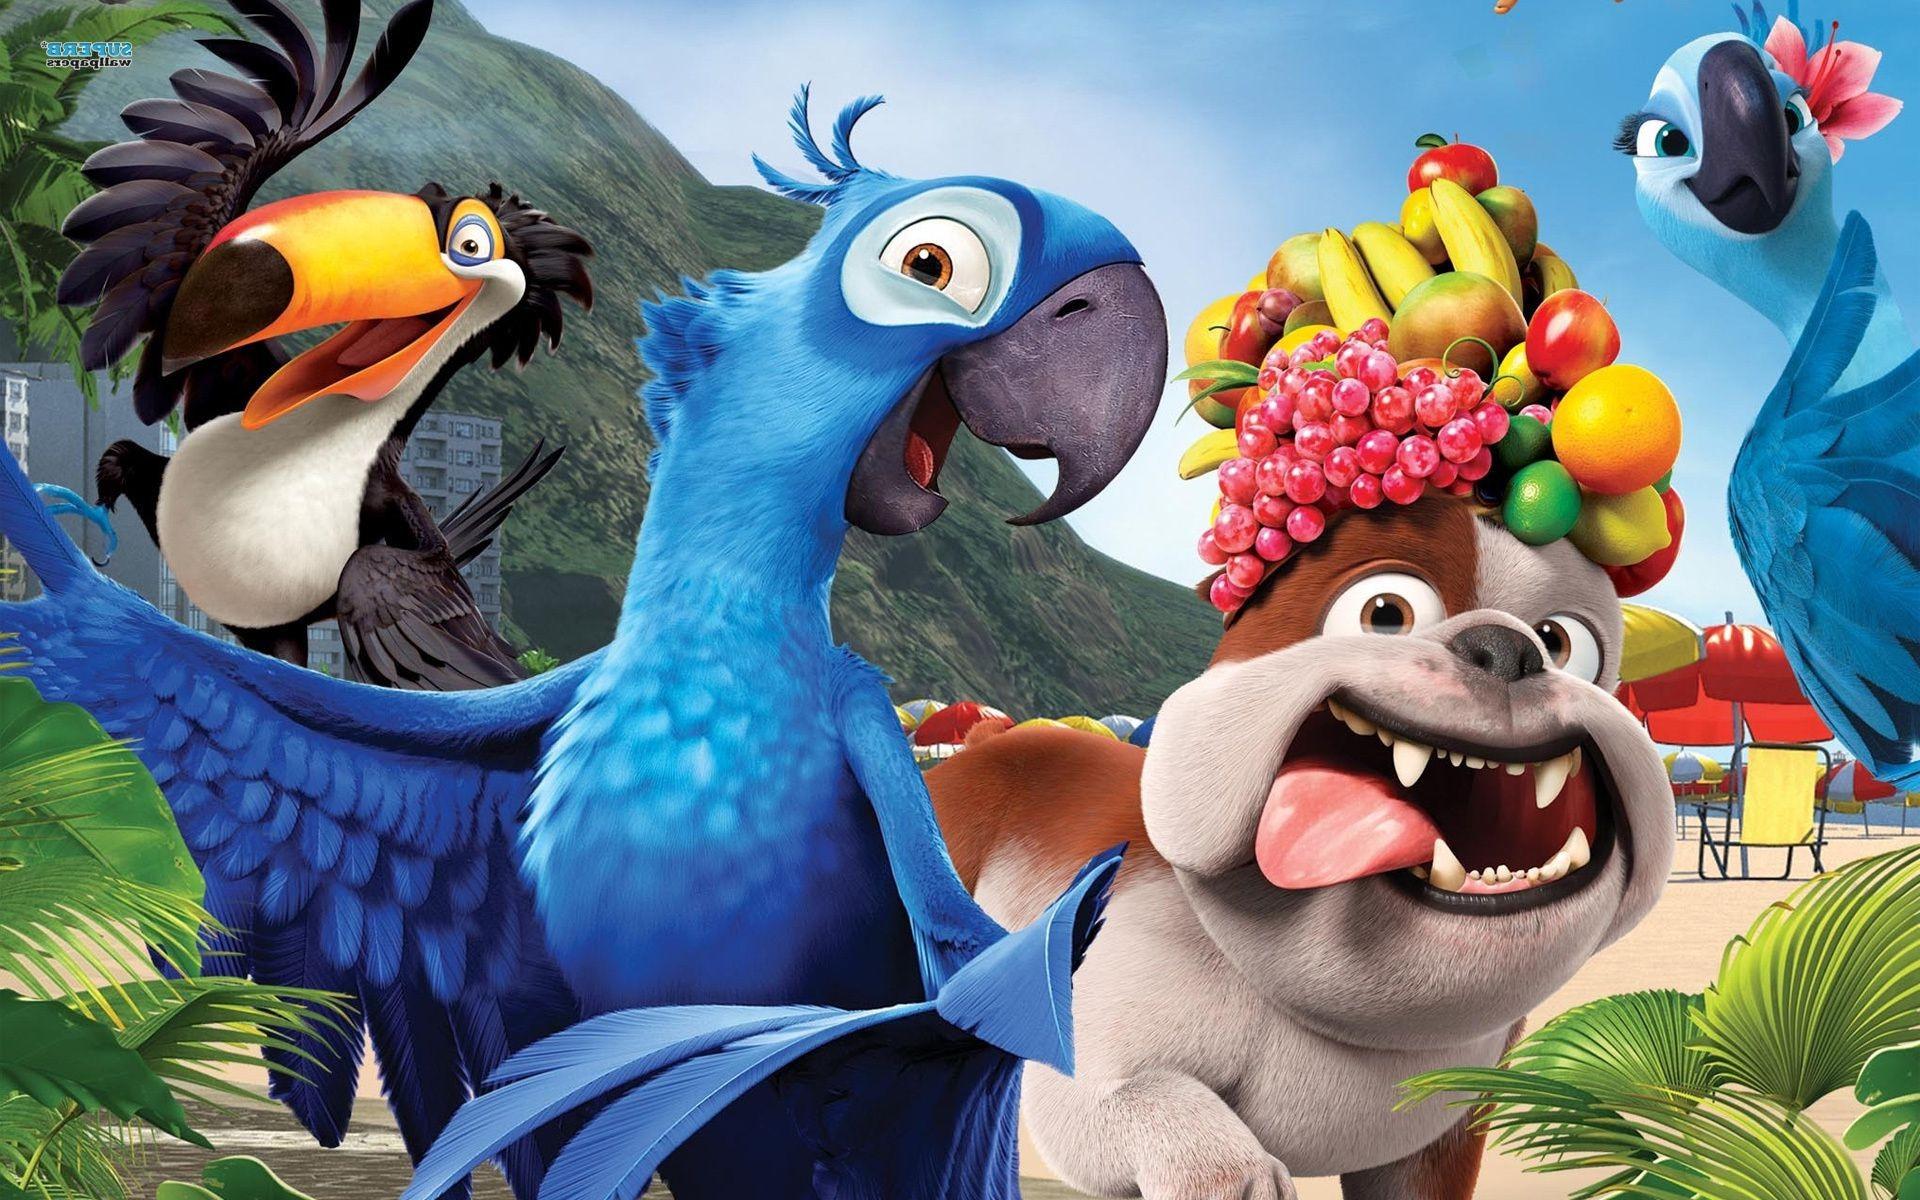 Fruit Parrots Rio Dog Cartoon Rio Phone Wallpapers